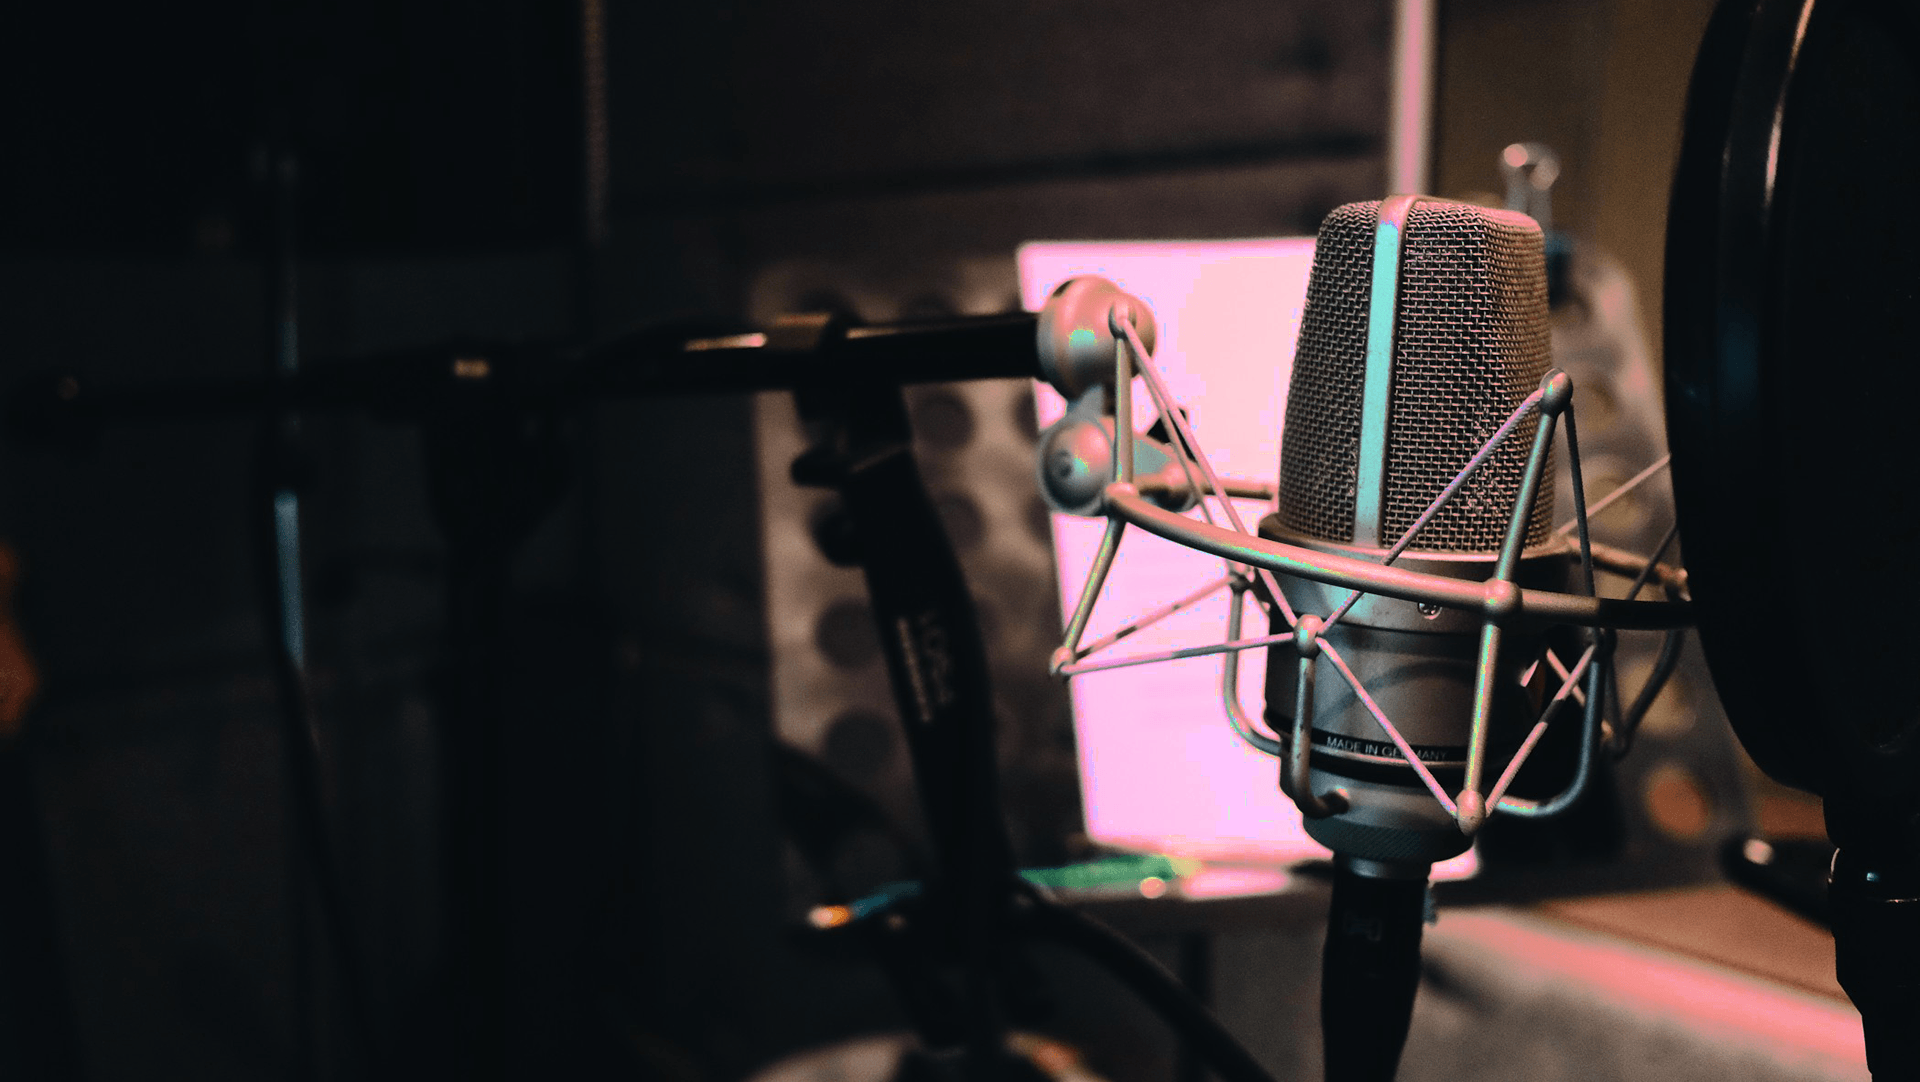 Condenser mic in a studio